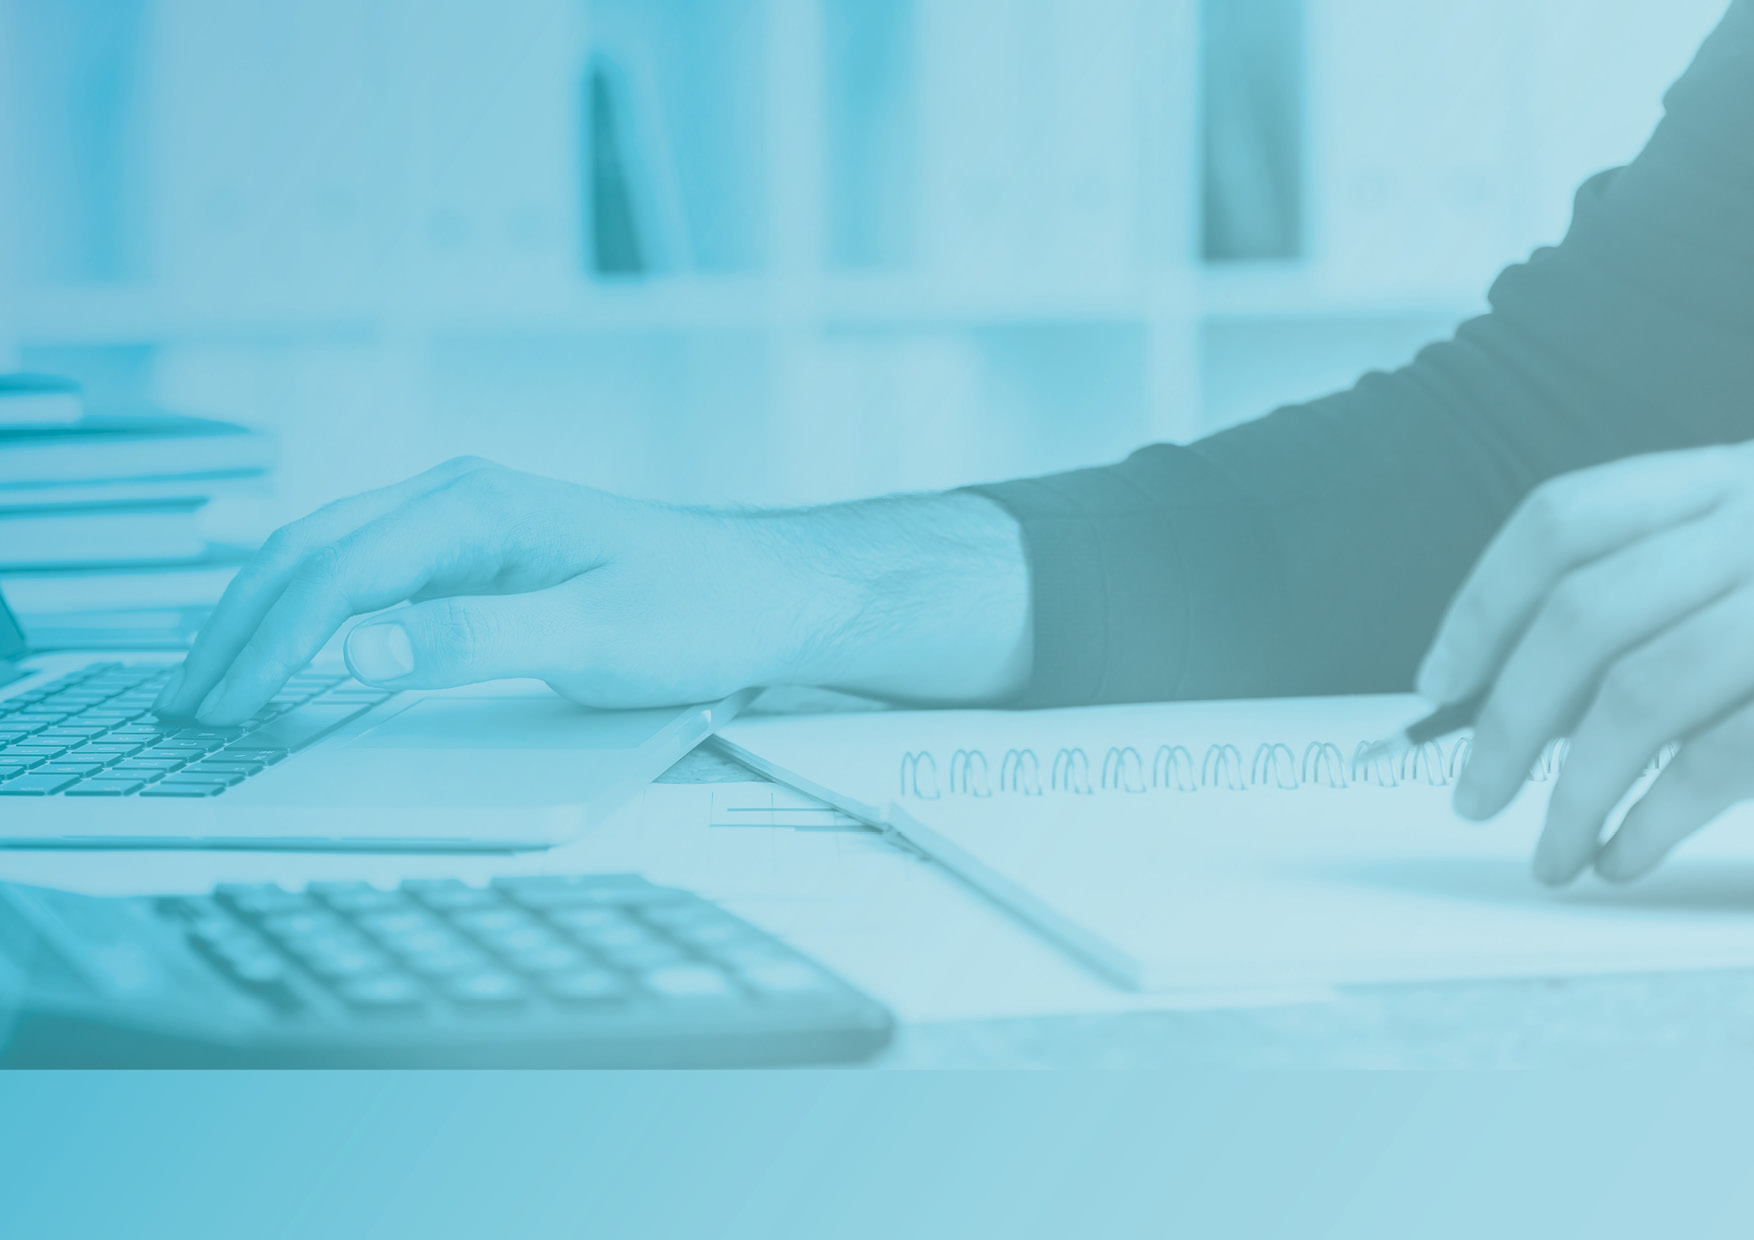 Accounting & Taxation -